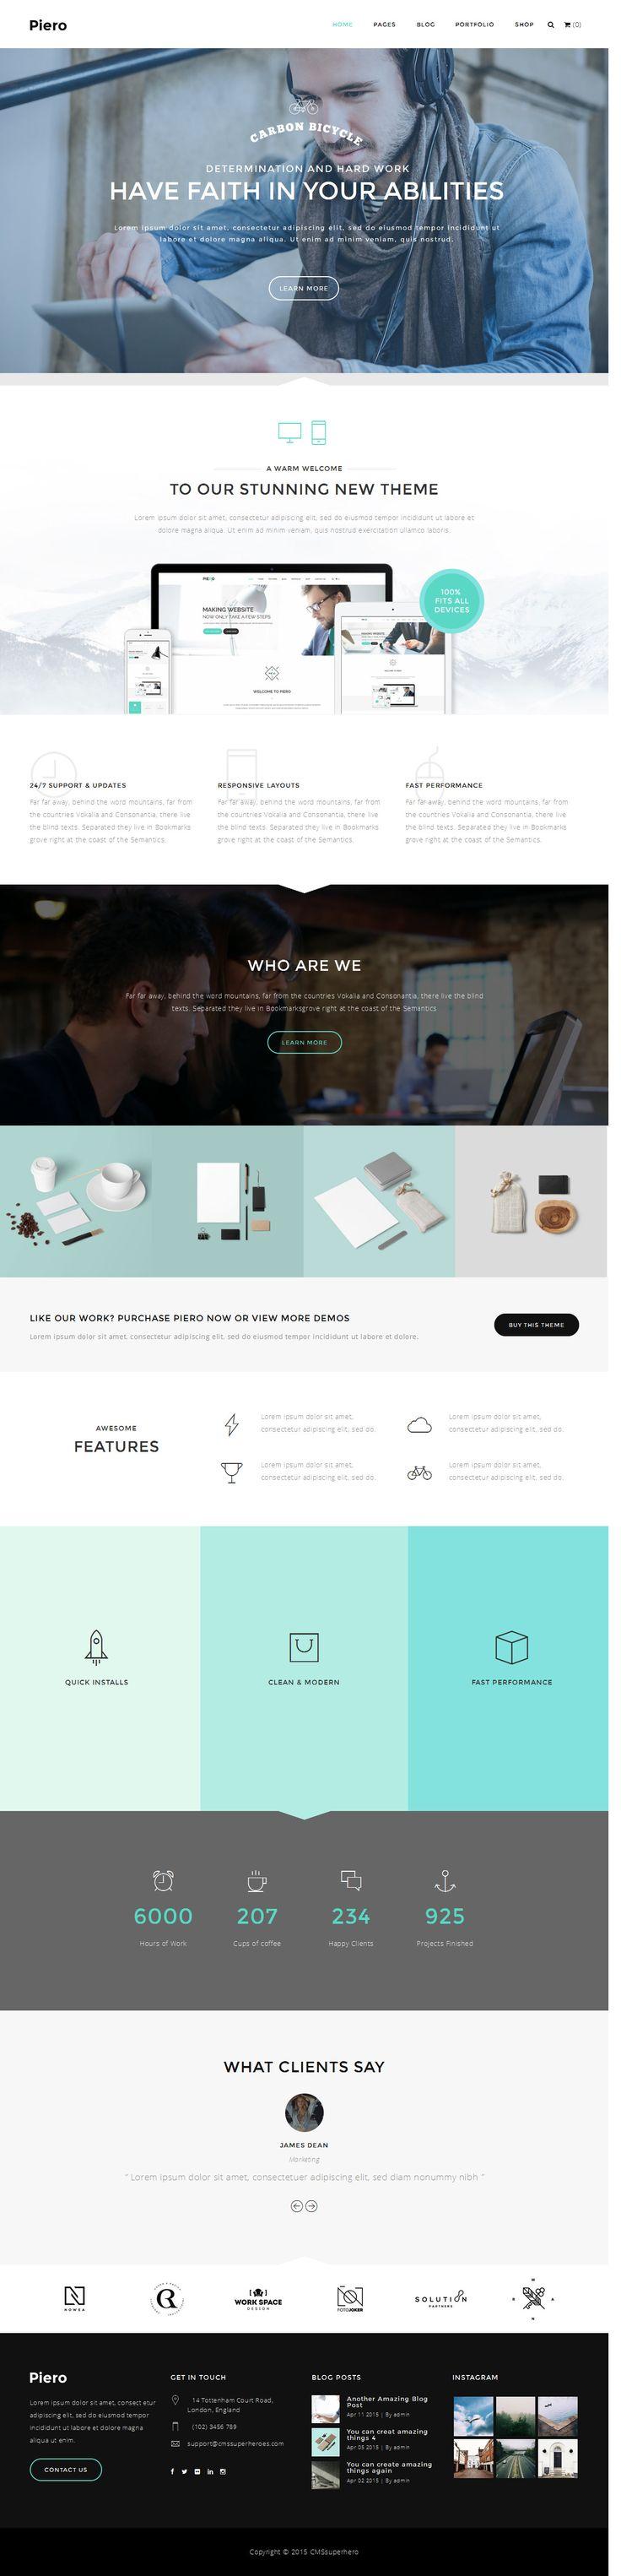 PIERO is a stunning and professional Corporate/Freelance/Agency/Creative wordpress theme #webdesign Download: http://themeforest.net/item/piero-clean-modern-multiuse-wordpress-theme/10714925?ref=ksioks